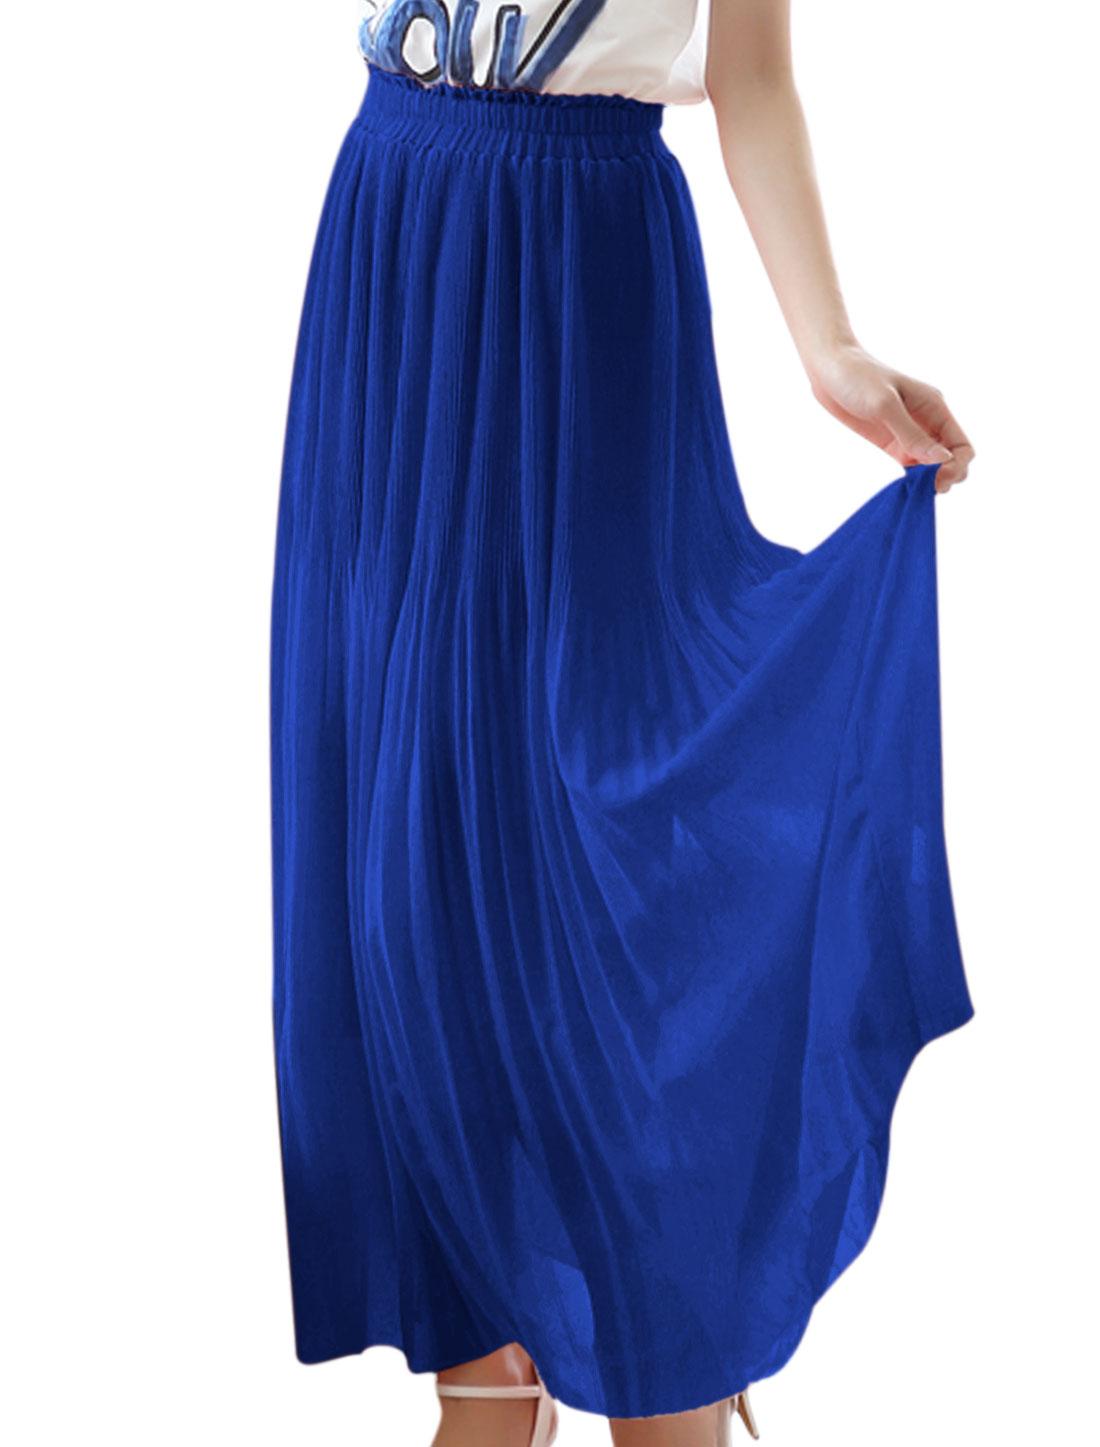 Lady Stretchy Waist Lining Long Chiffon A-Line Skirt Royal XS